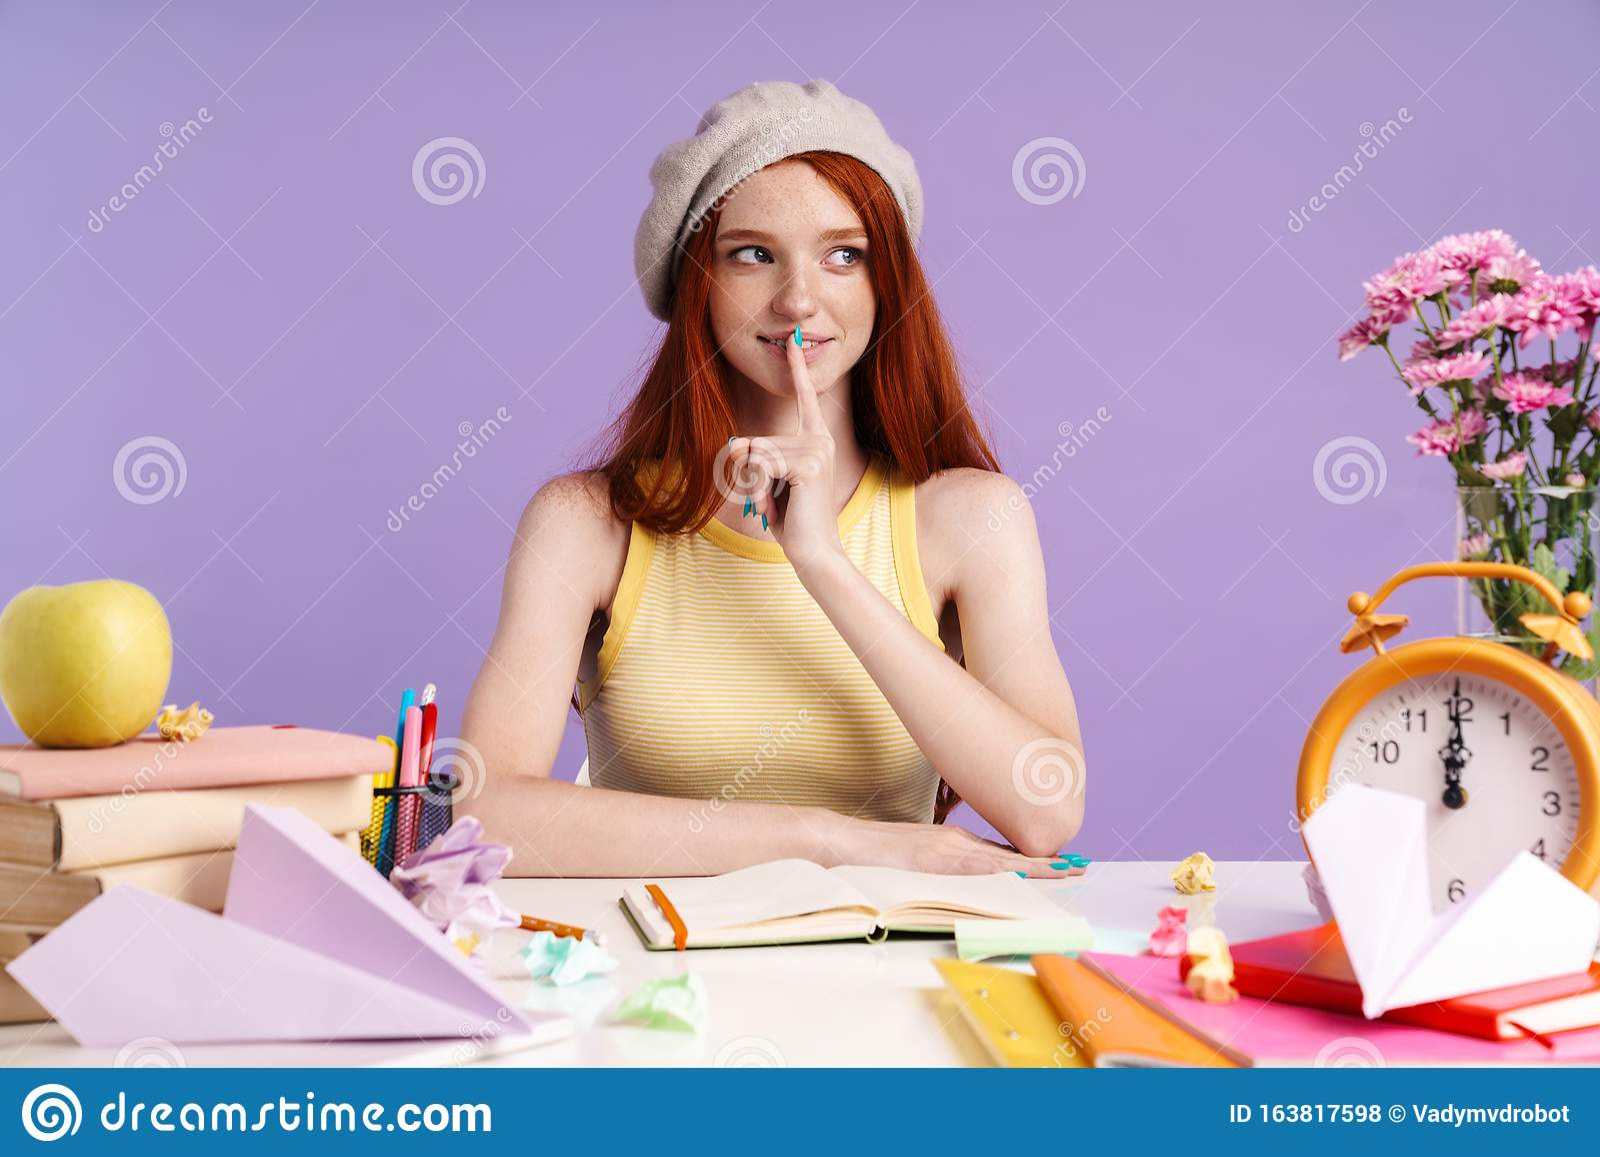 Студентке работа девушке развод фото вк